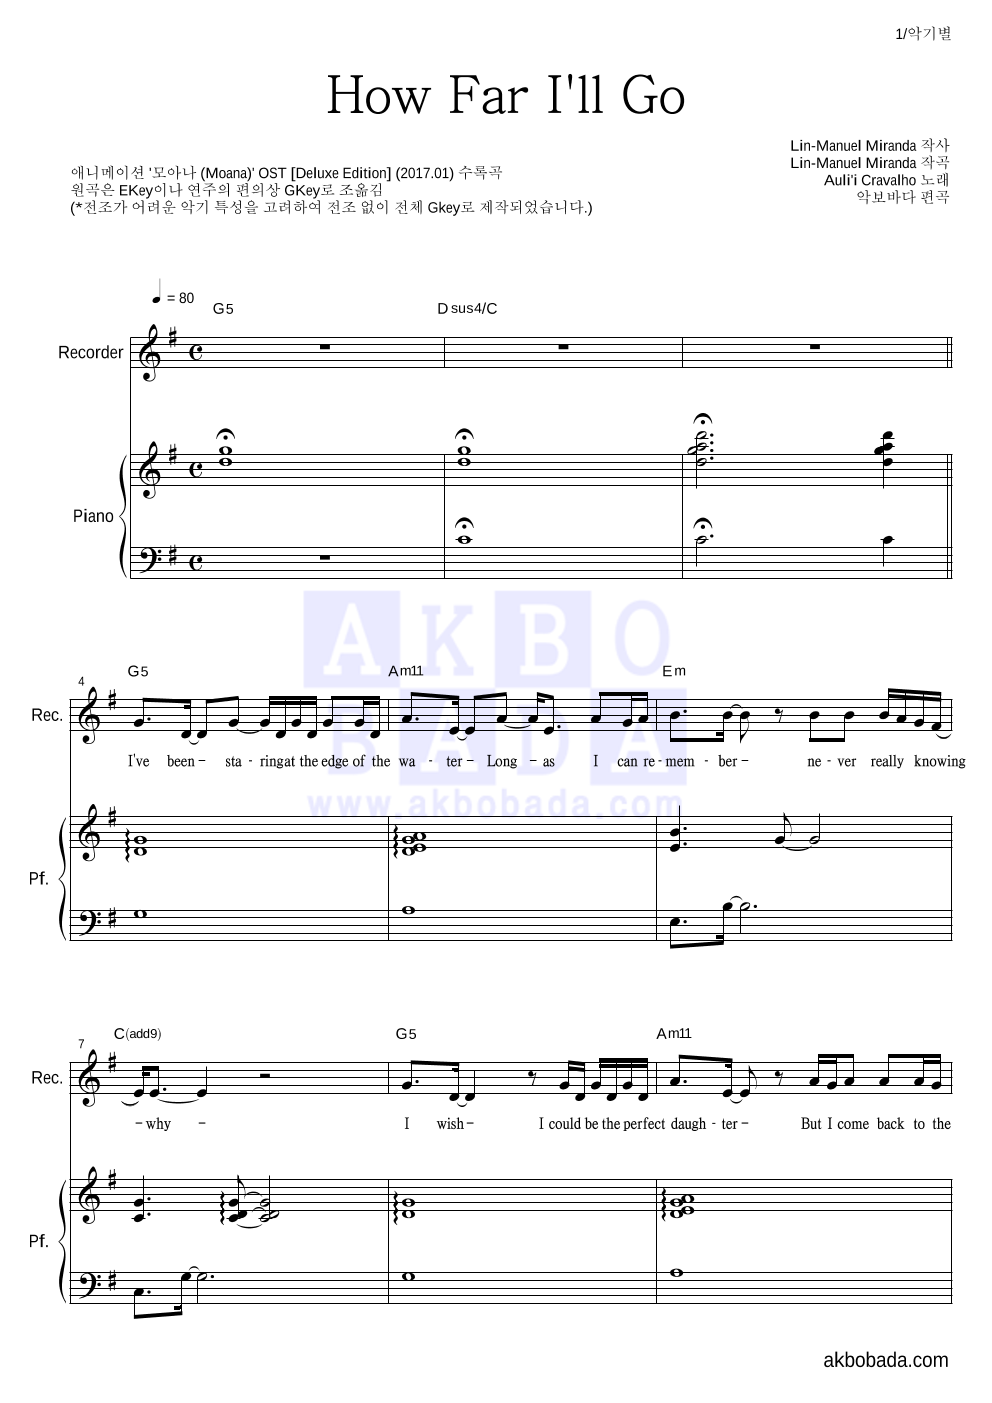 Auli'i Cravalho - How Far I'll Go 리코더&피아노 악보